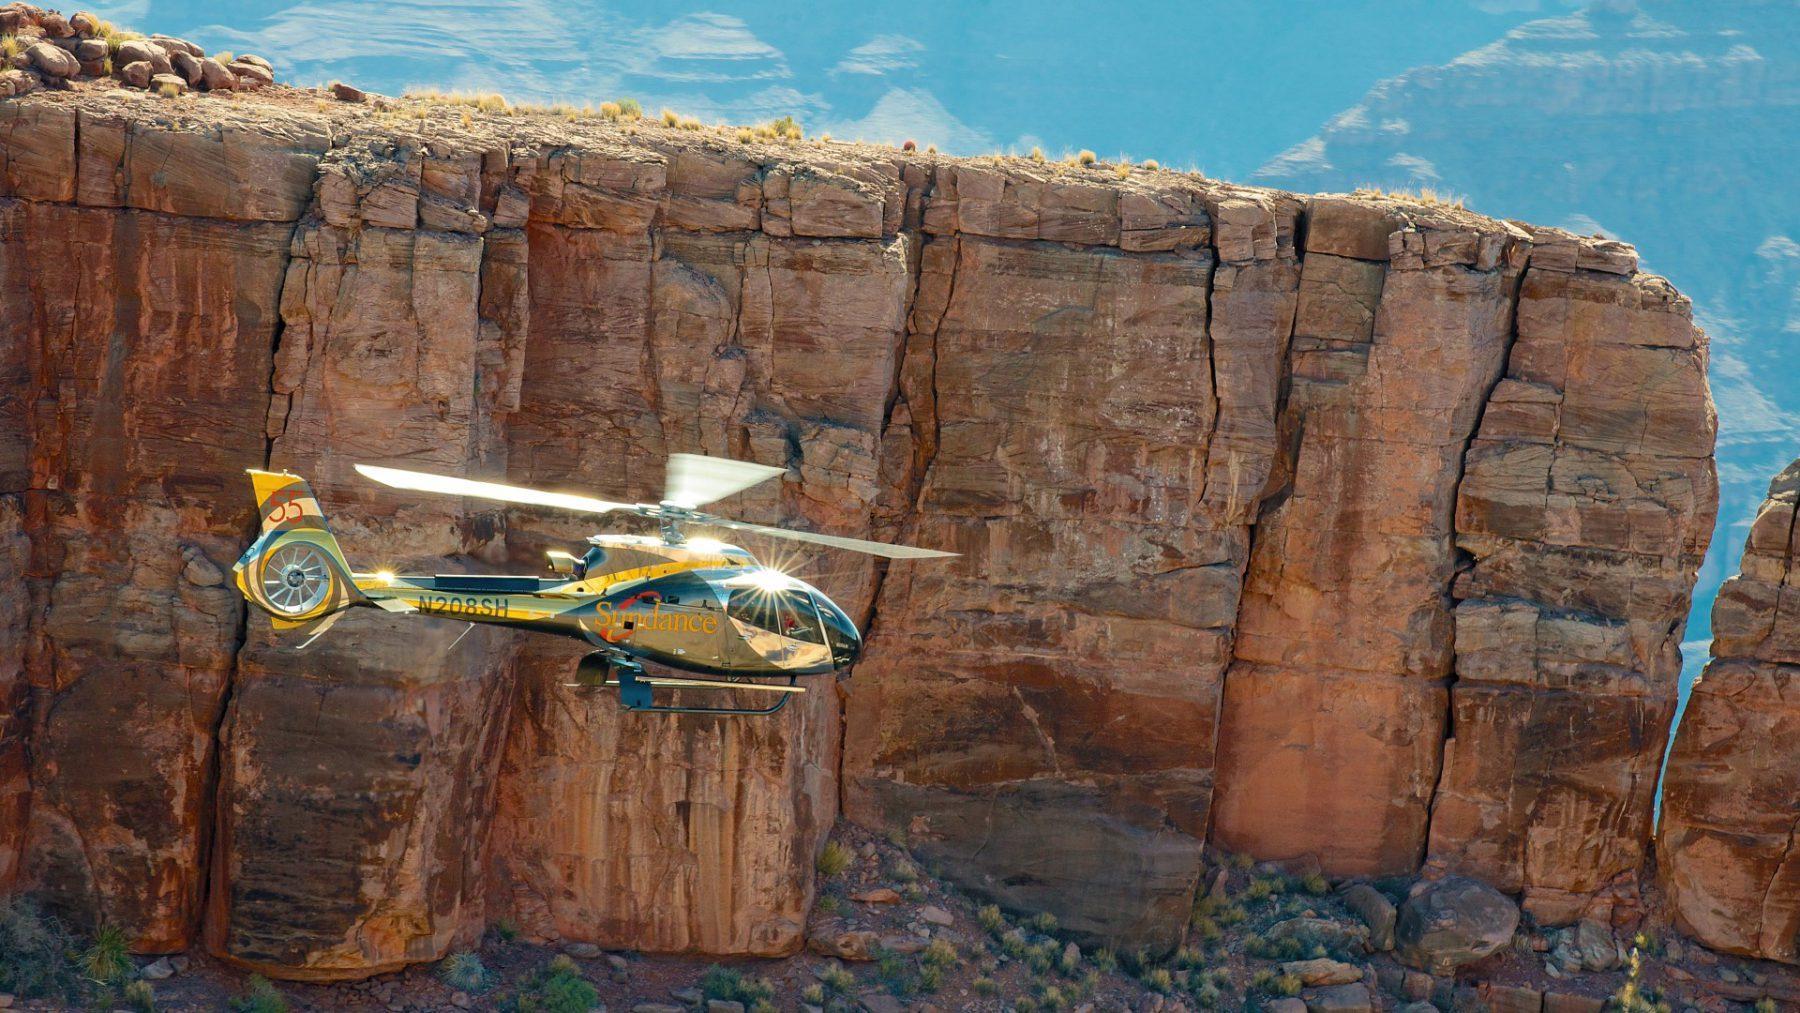 Las Vegas Grand Canyon Helicopter Tour